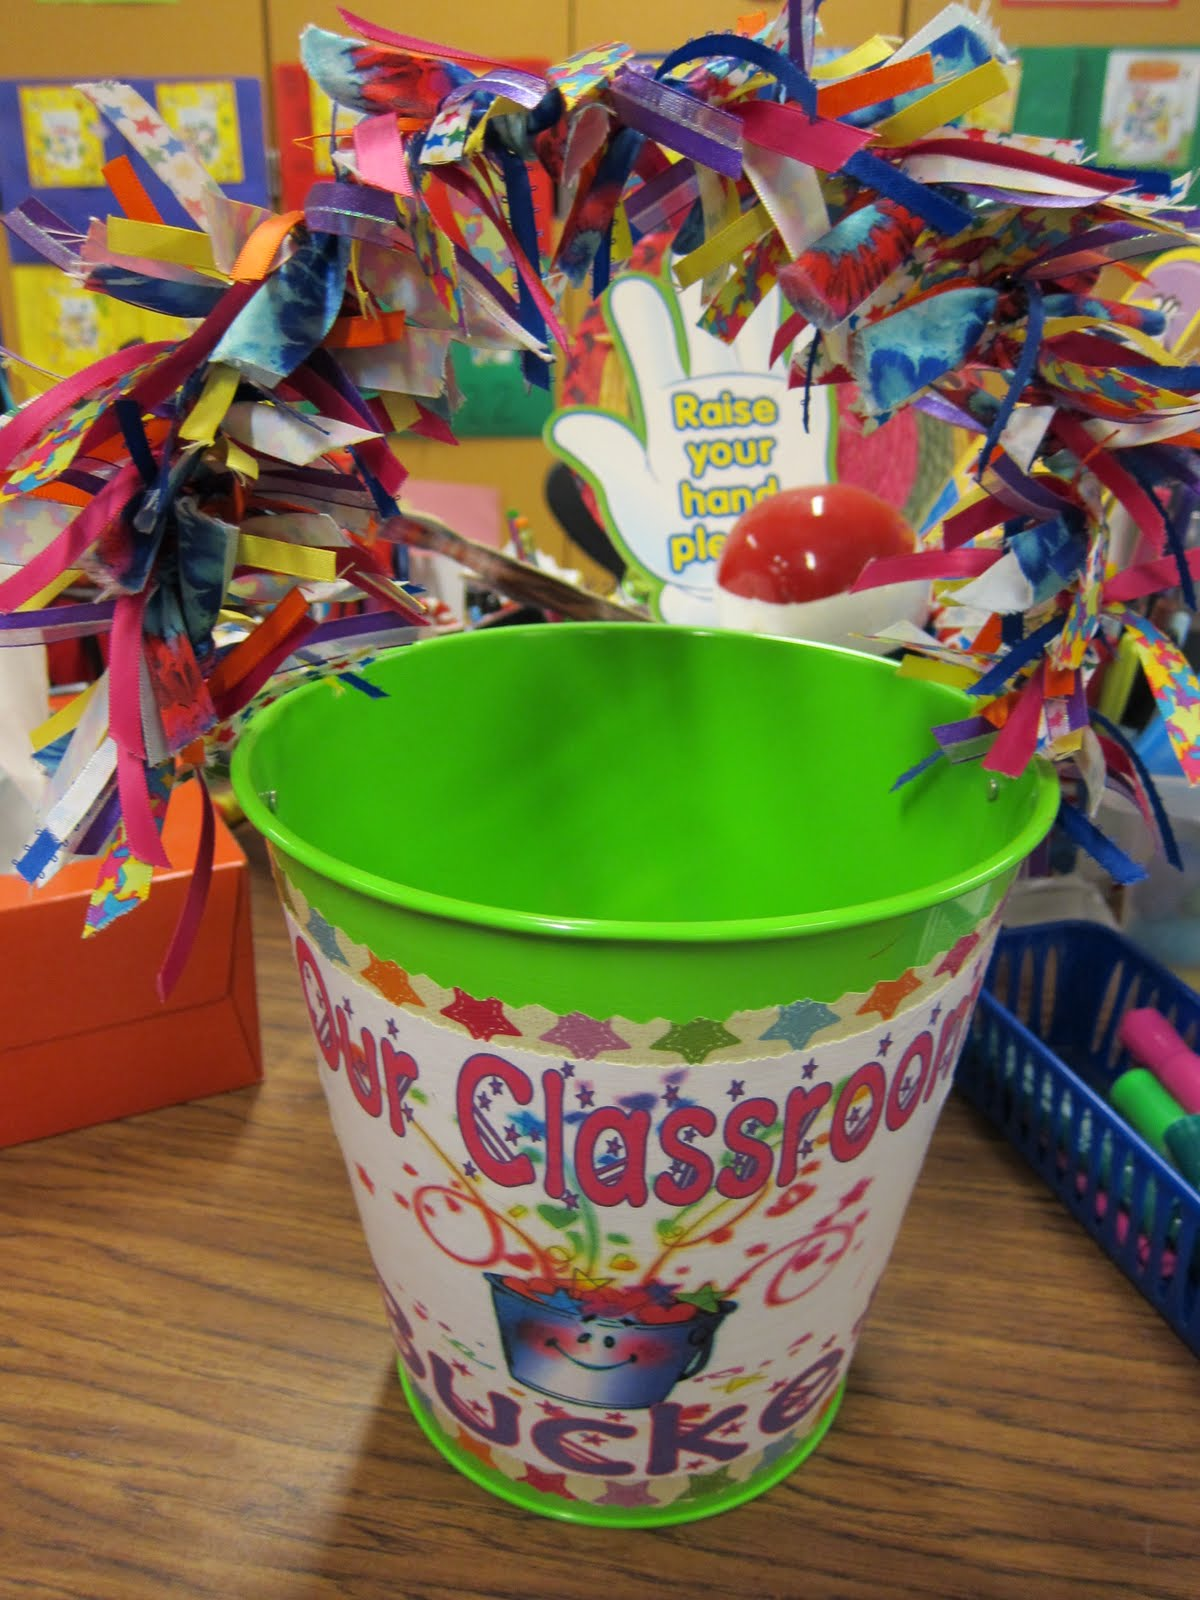 Seusstastic Classroom Inspirations: Pinterest Linky Party